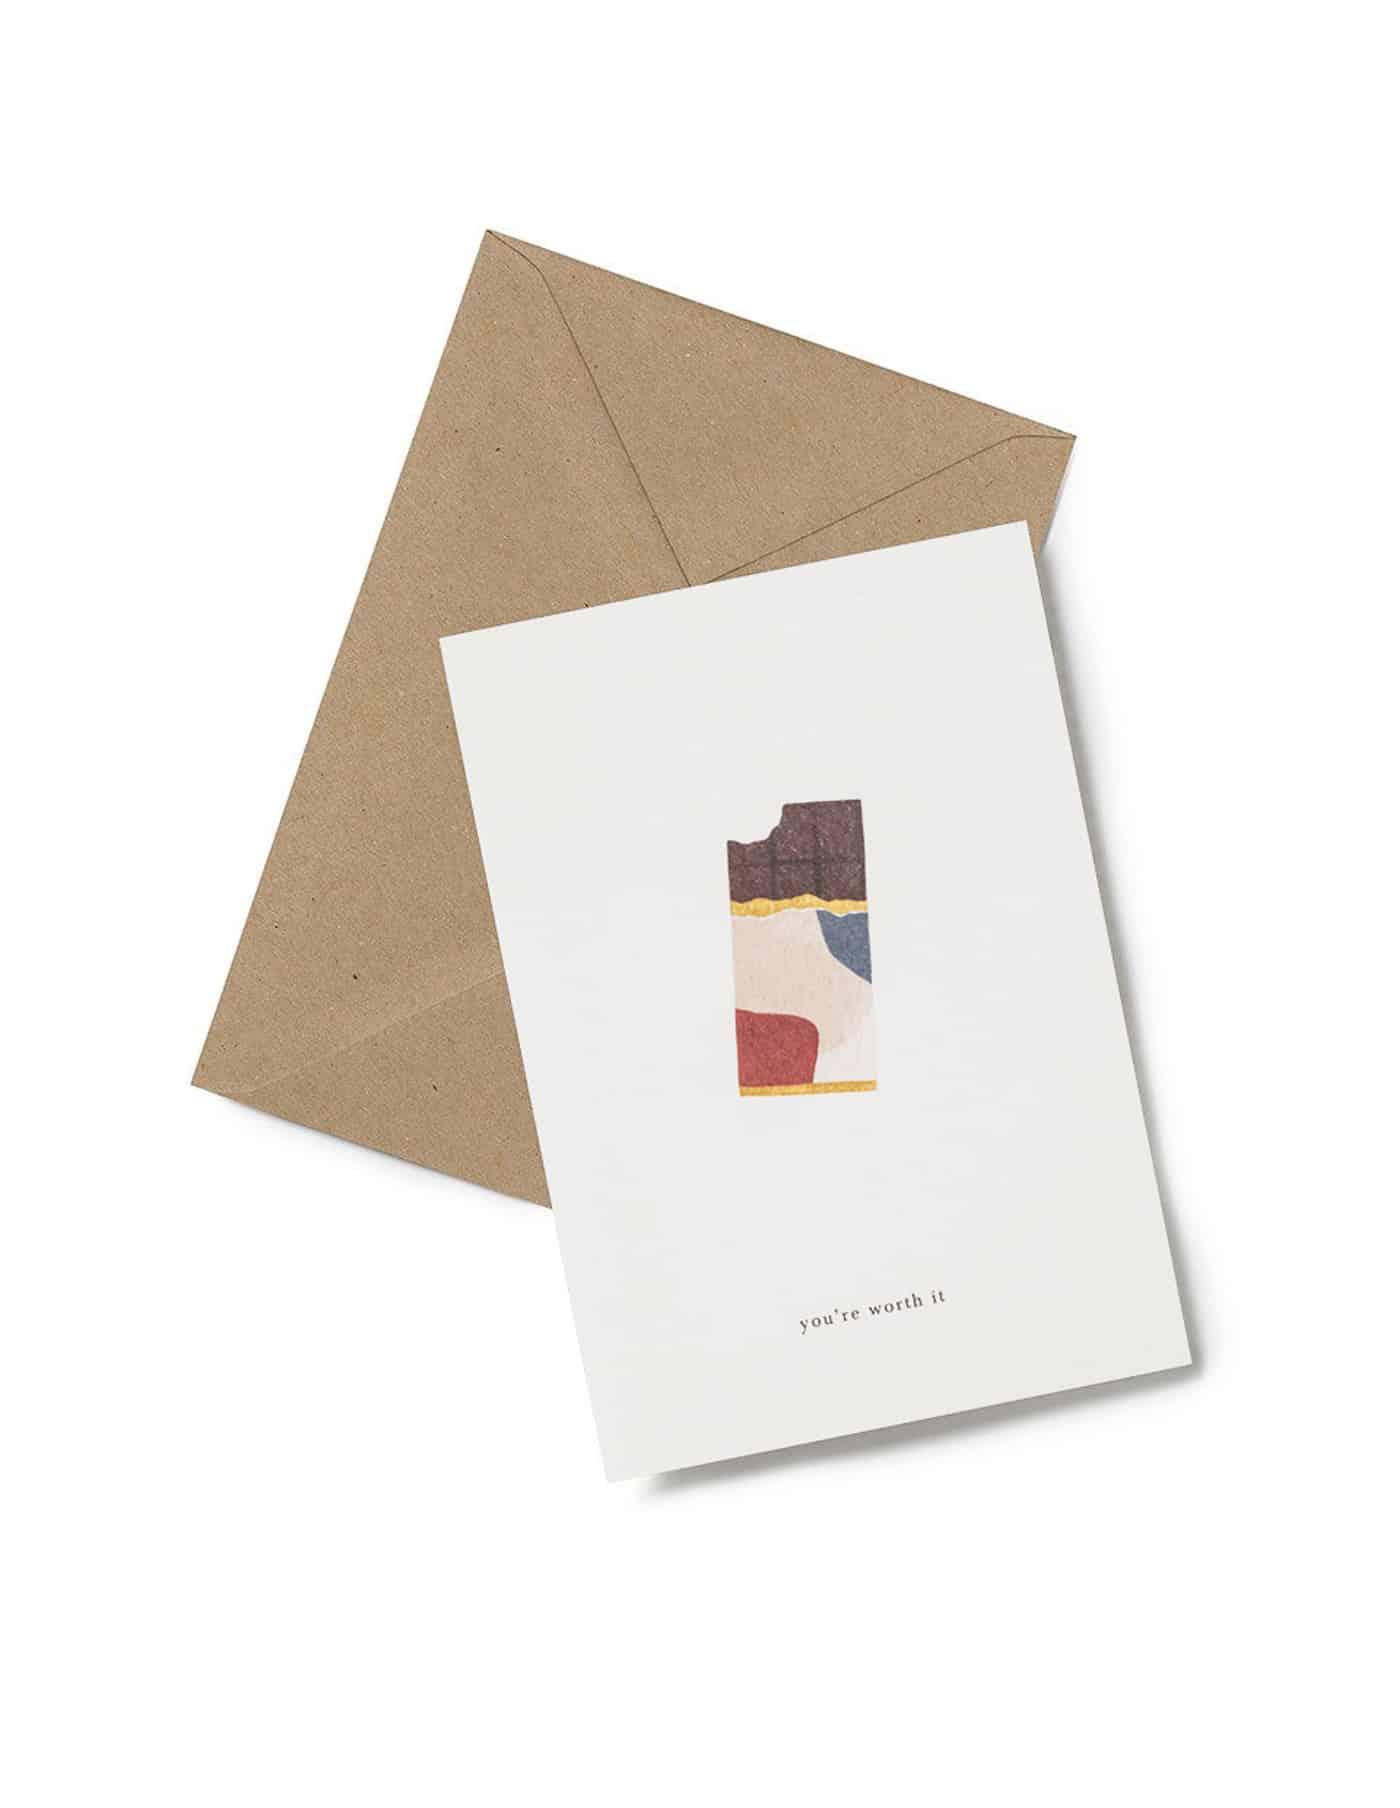 Kartotek 'you're worth it' Greeting Card